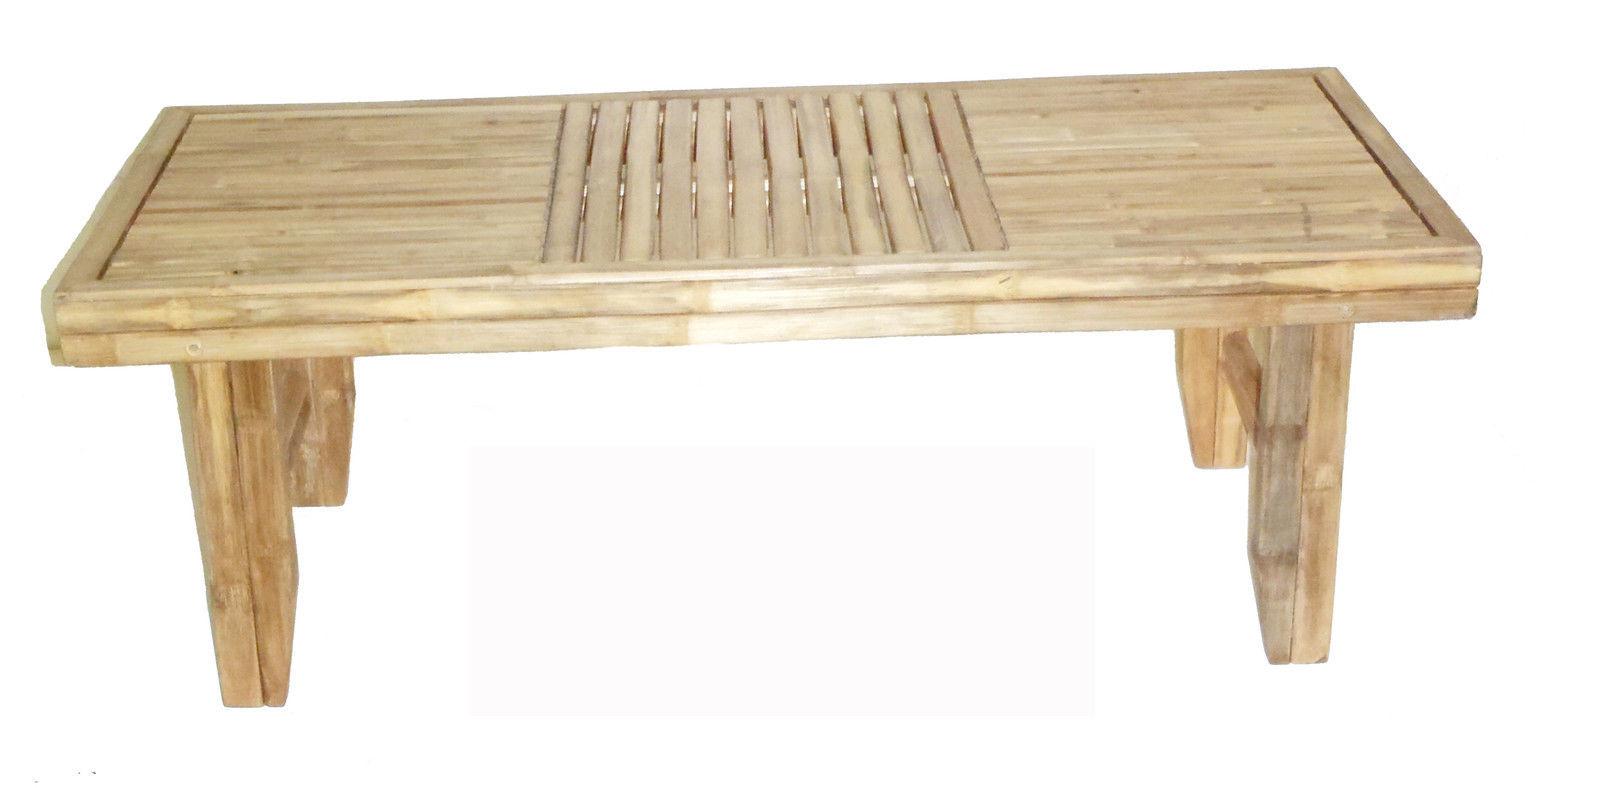 Deluxe Bamboo Tiki Folding Patio Deck Coffee Table  / Bench